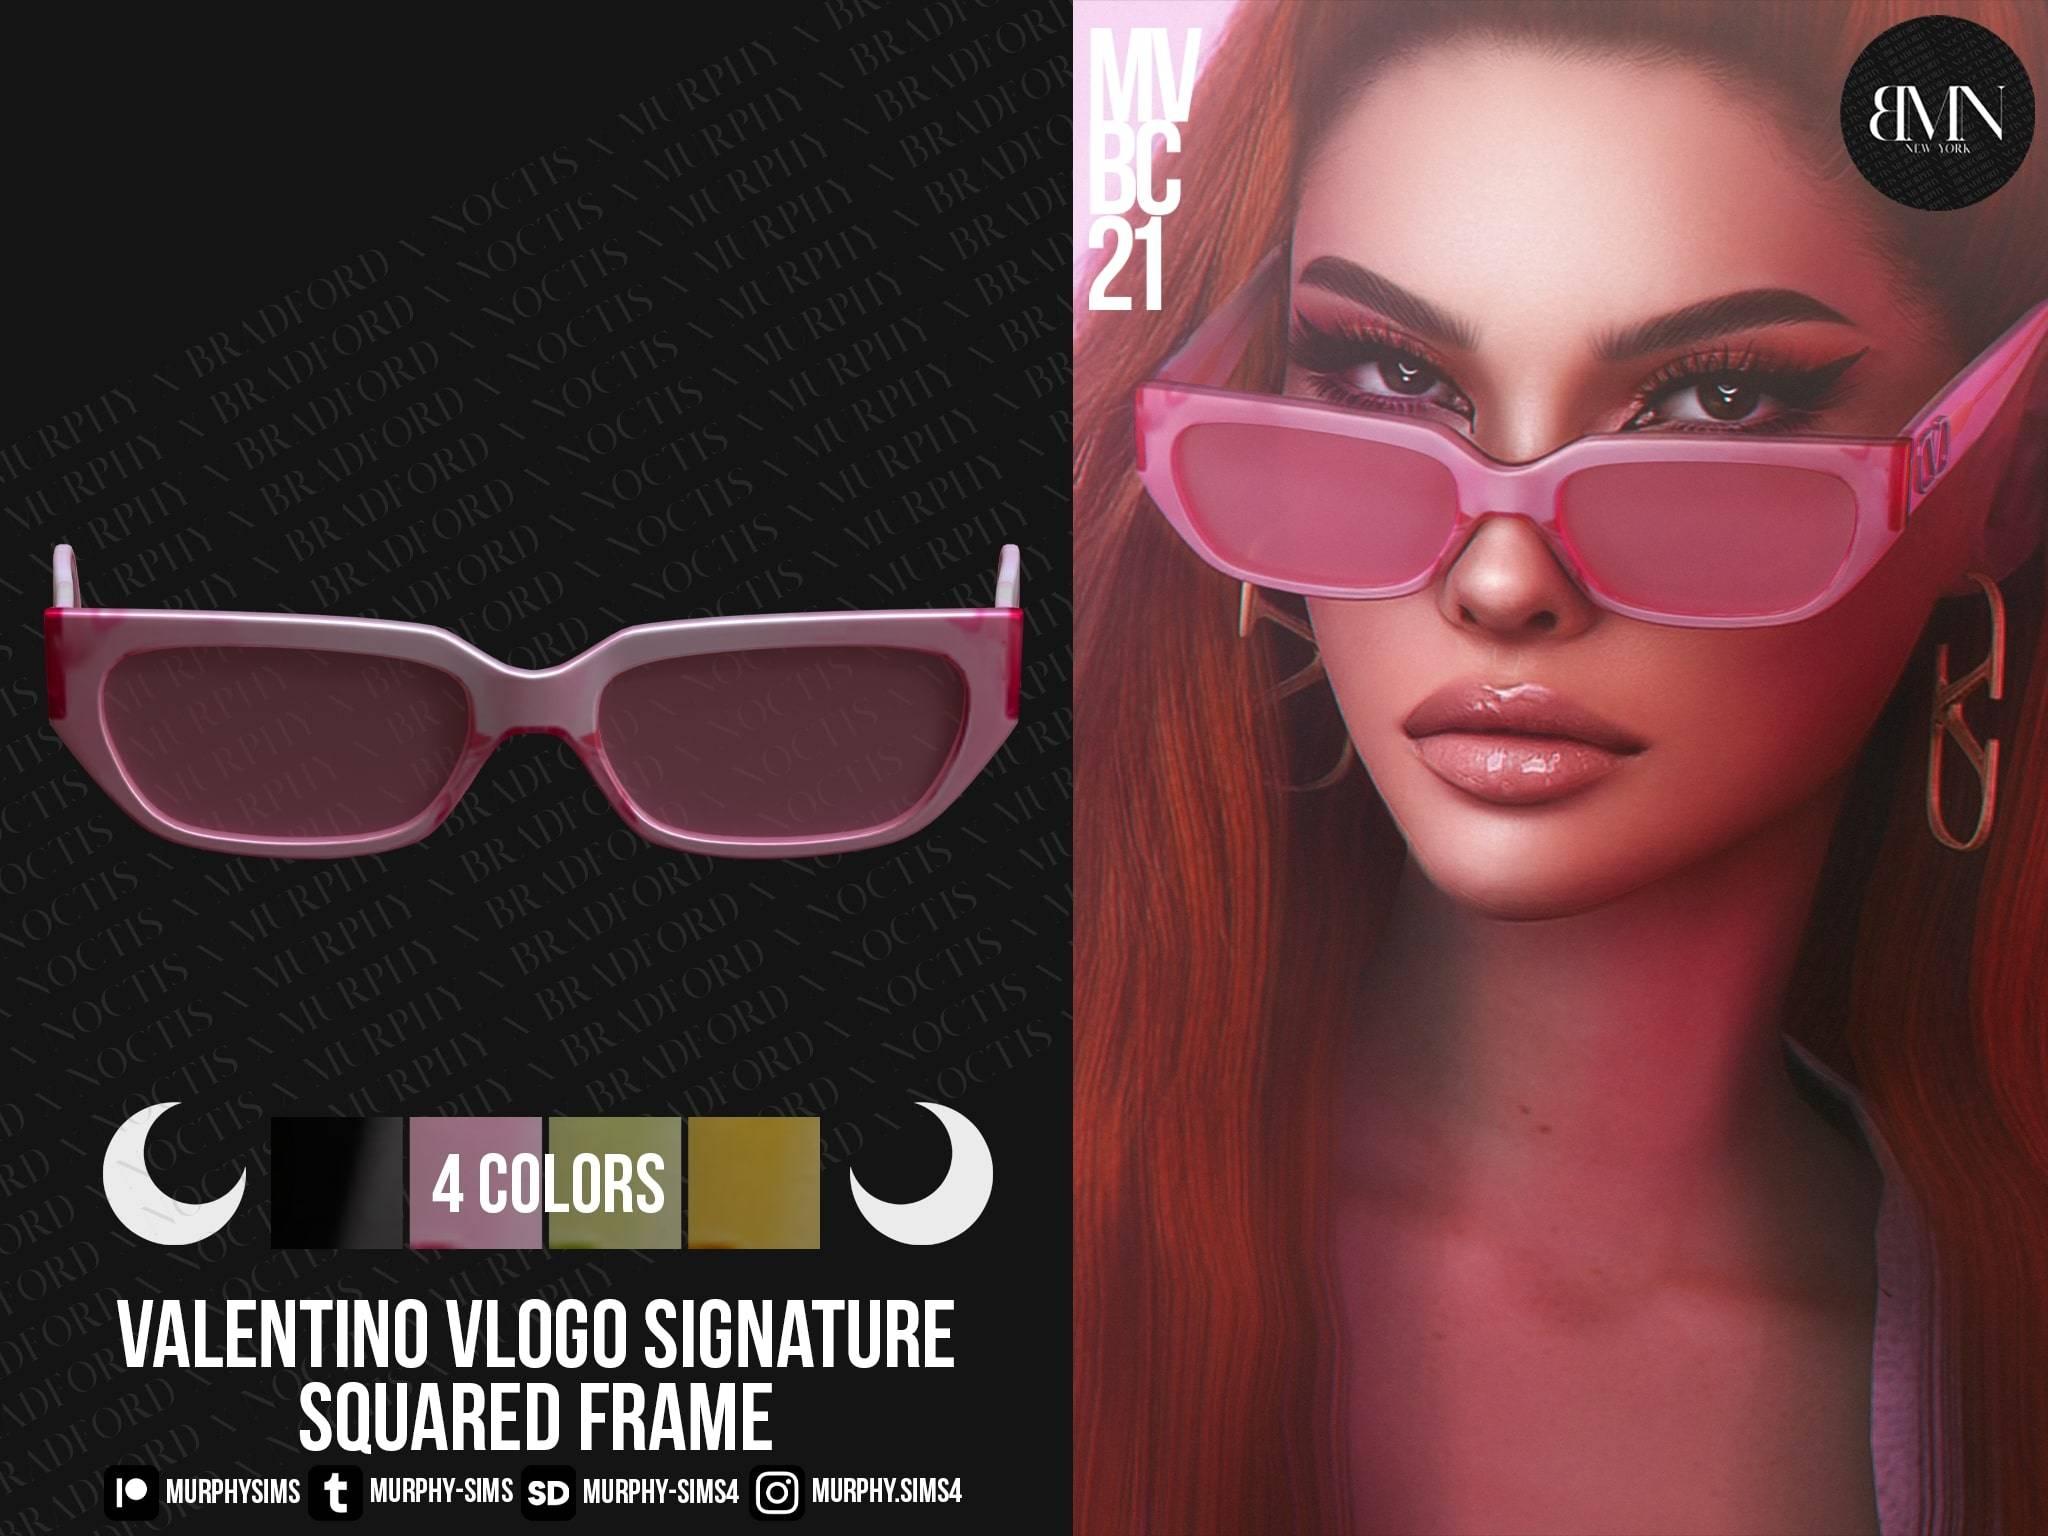 Солнечные очки - Valentino VLogo Signature Squared Acetate Frame